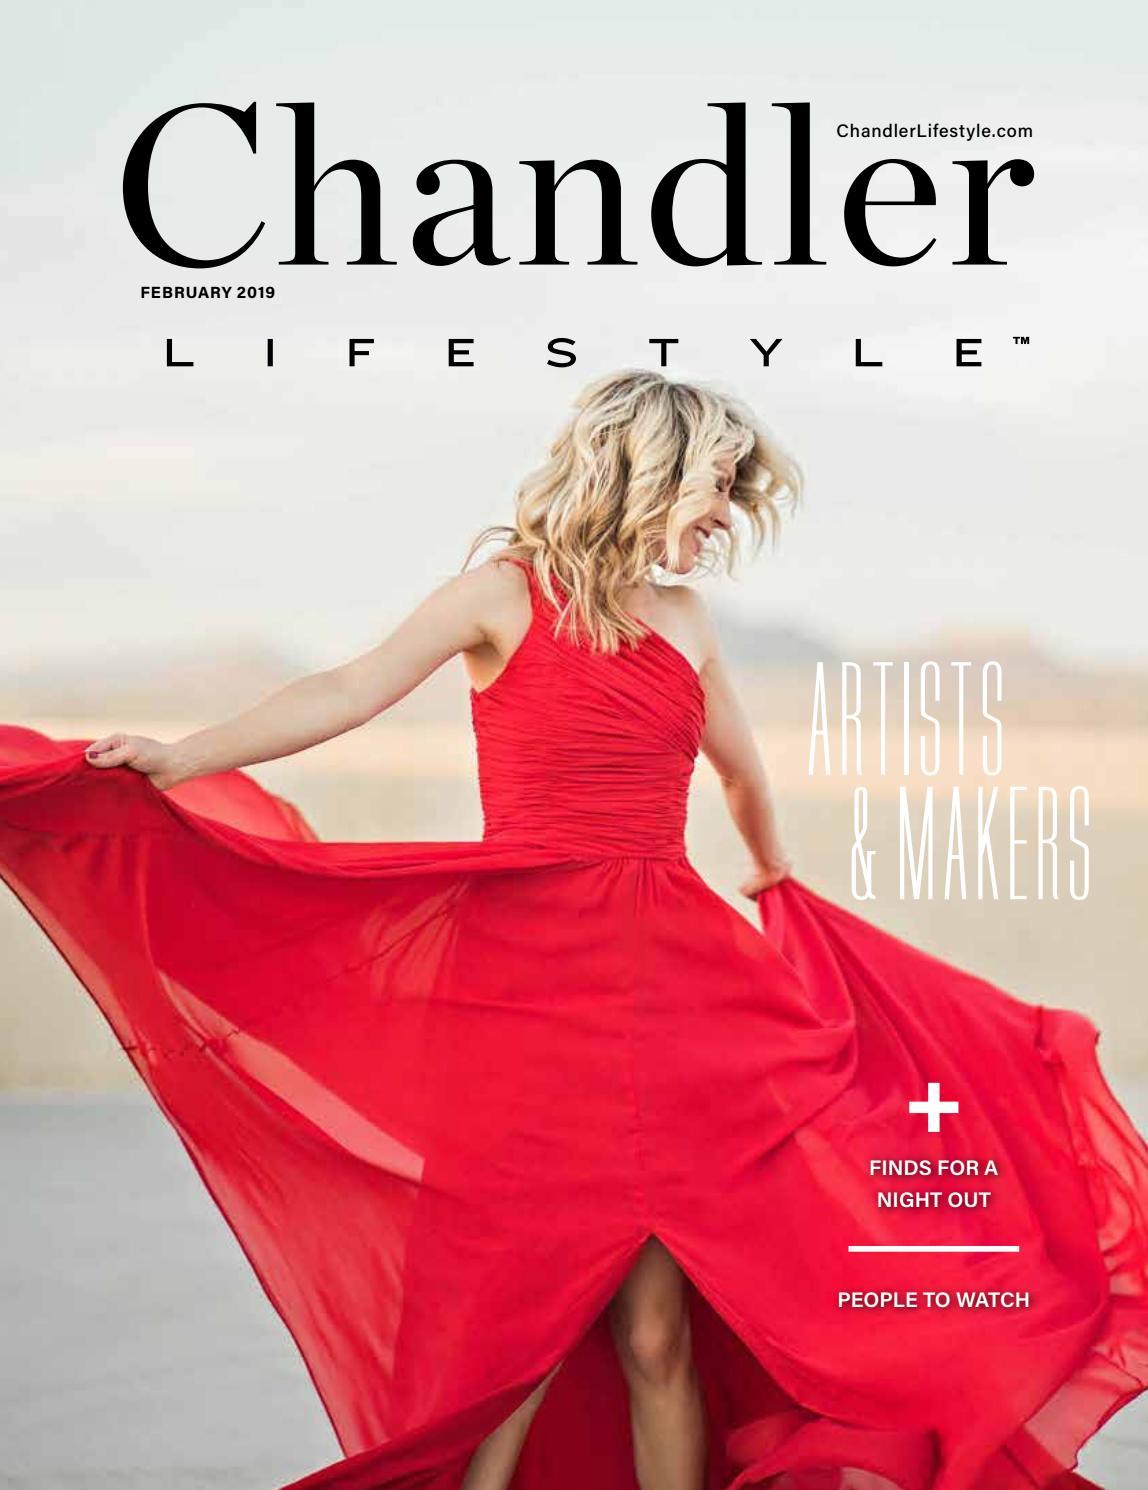 Chandler, AZ February 2019